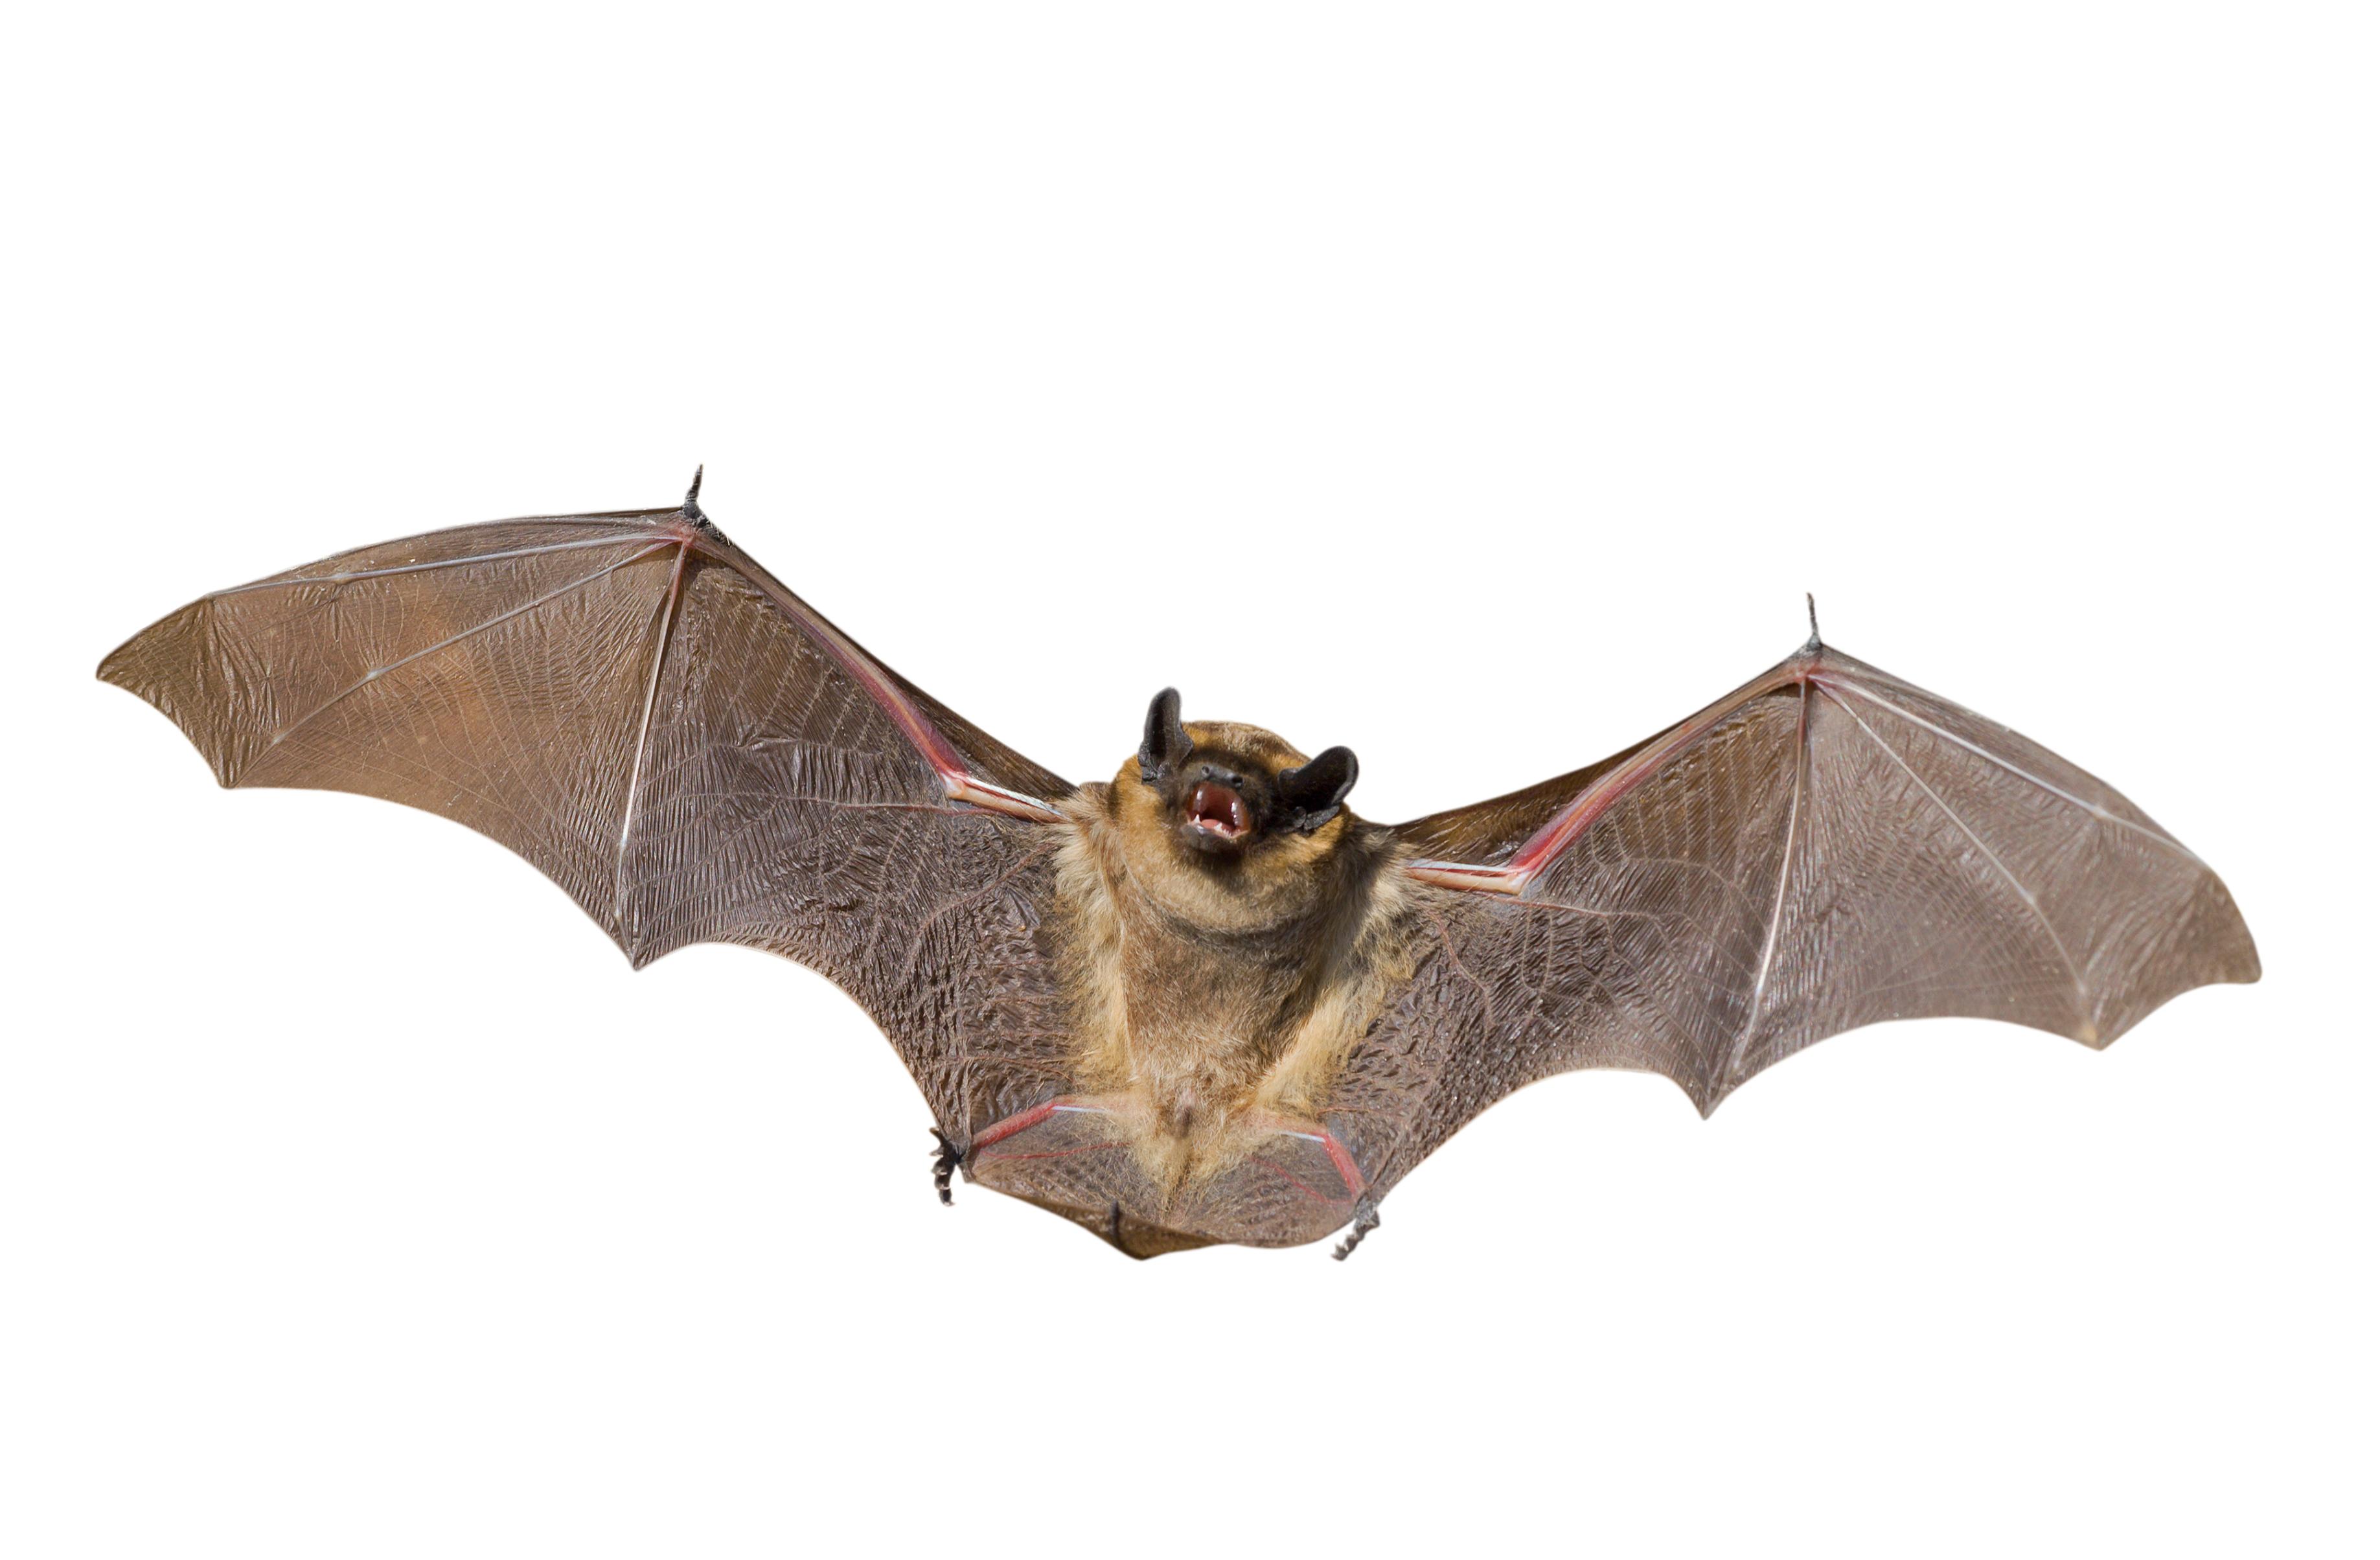 Bats Teach Us about Safety